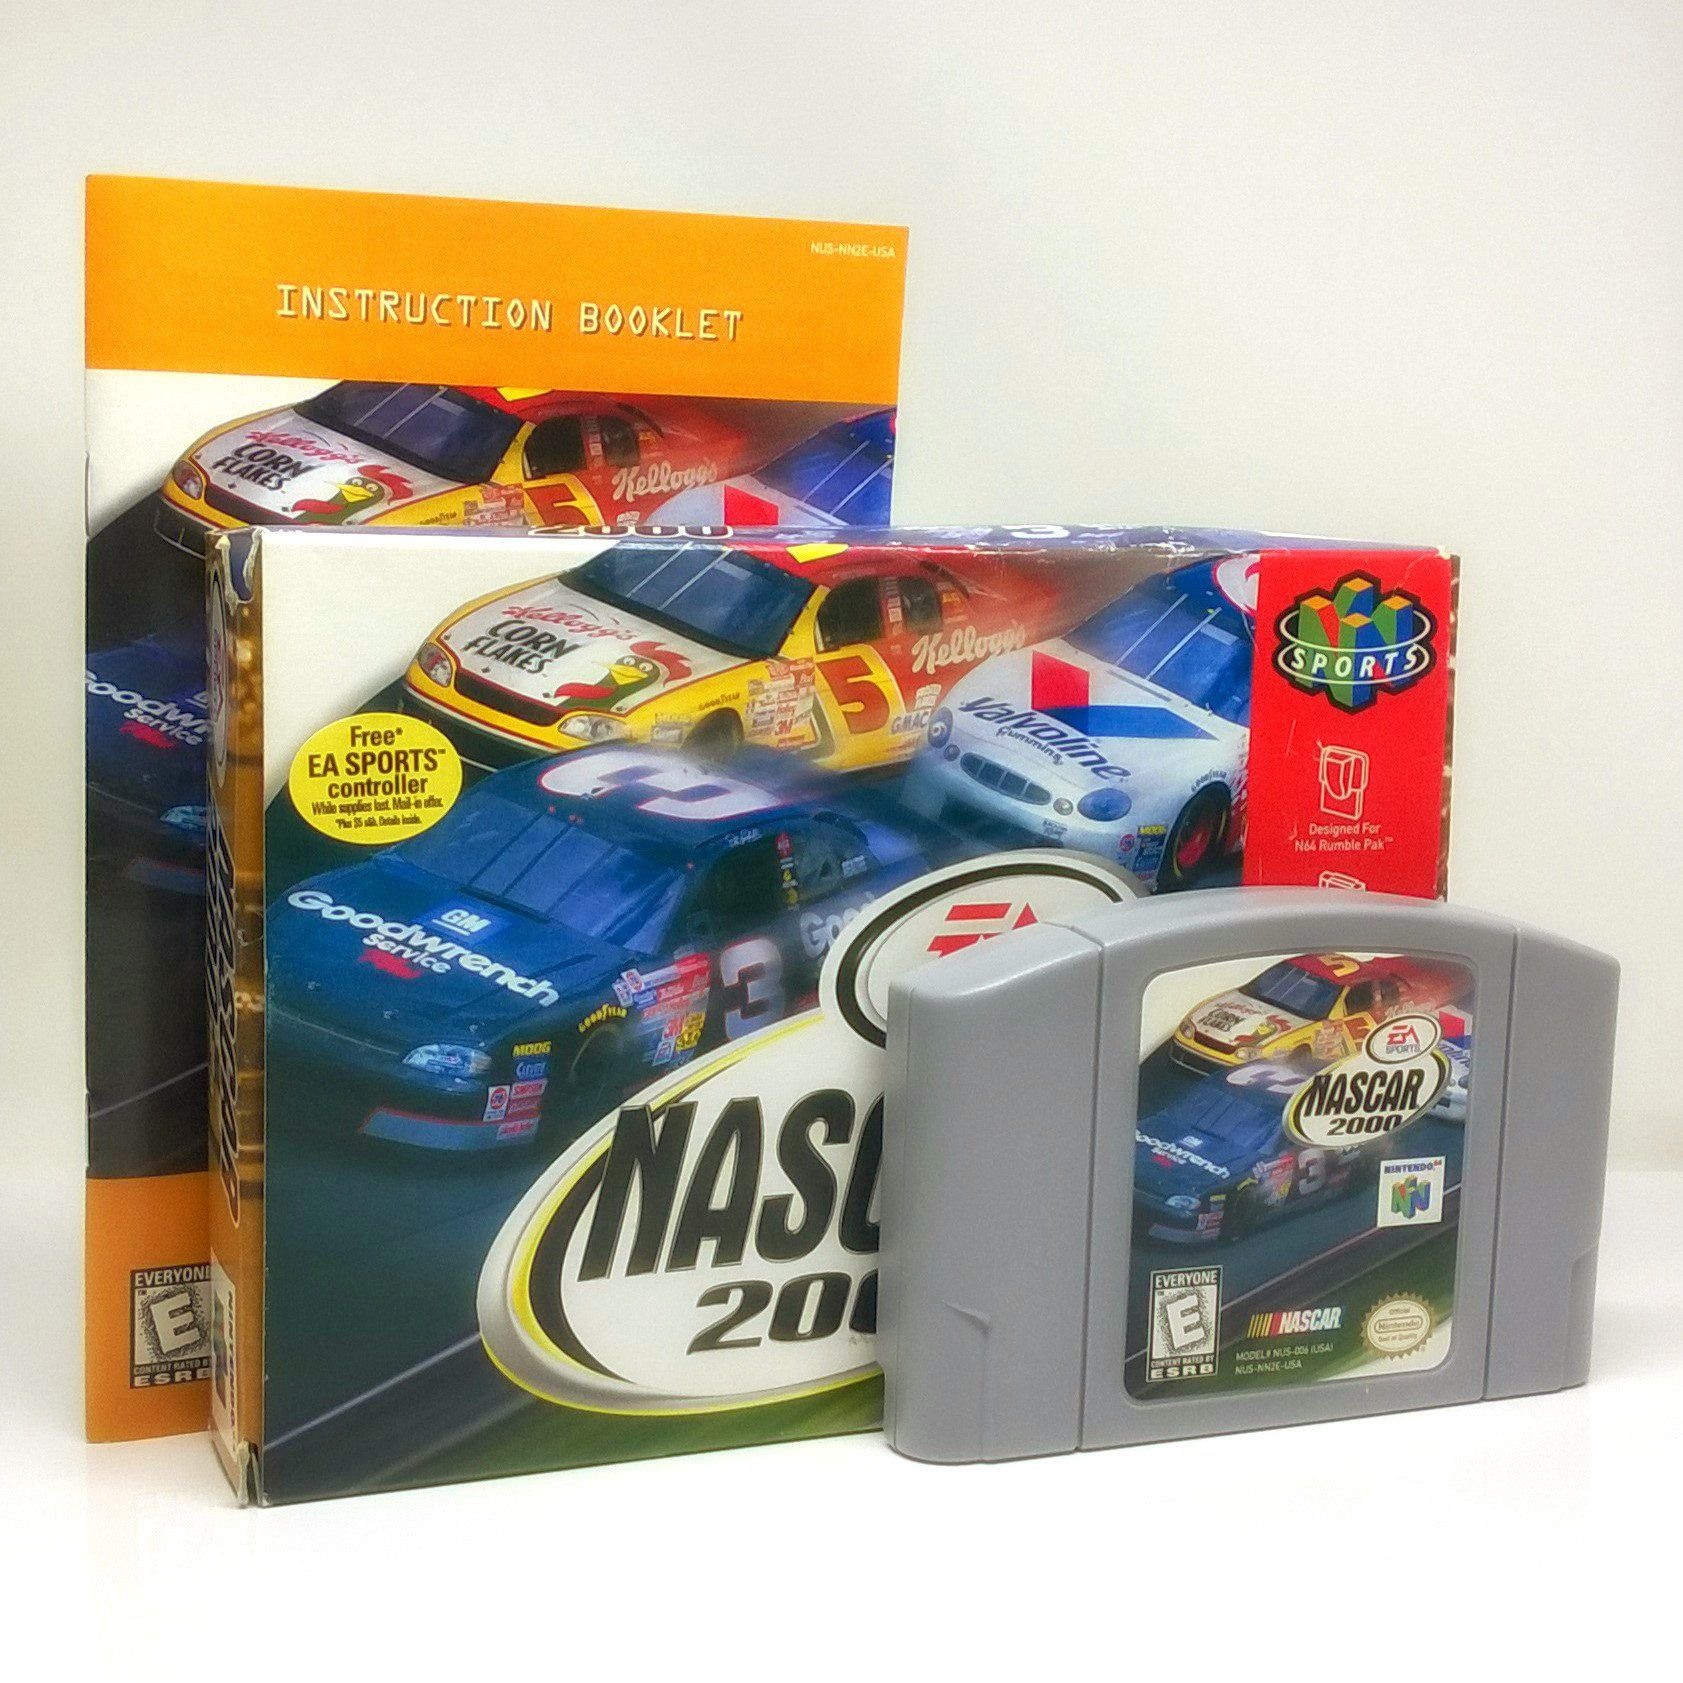 Nascar 2000 (With images) Nascar